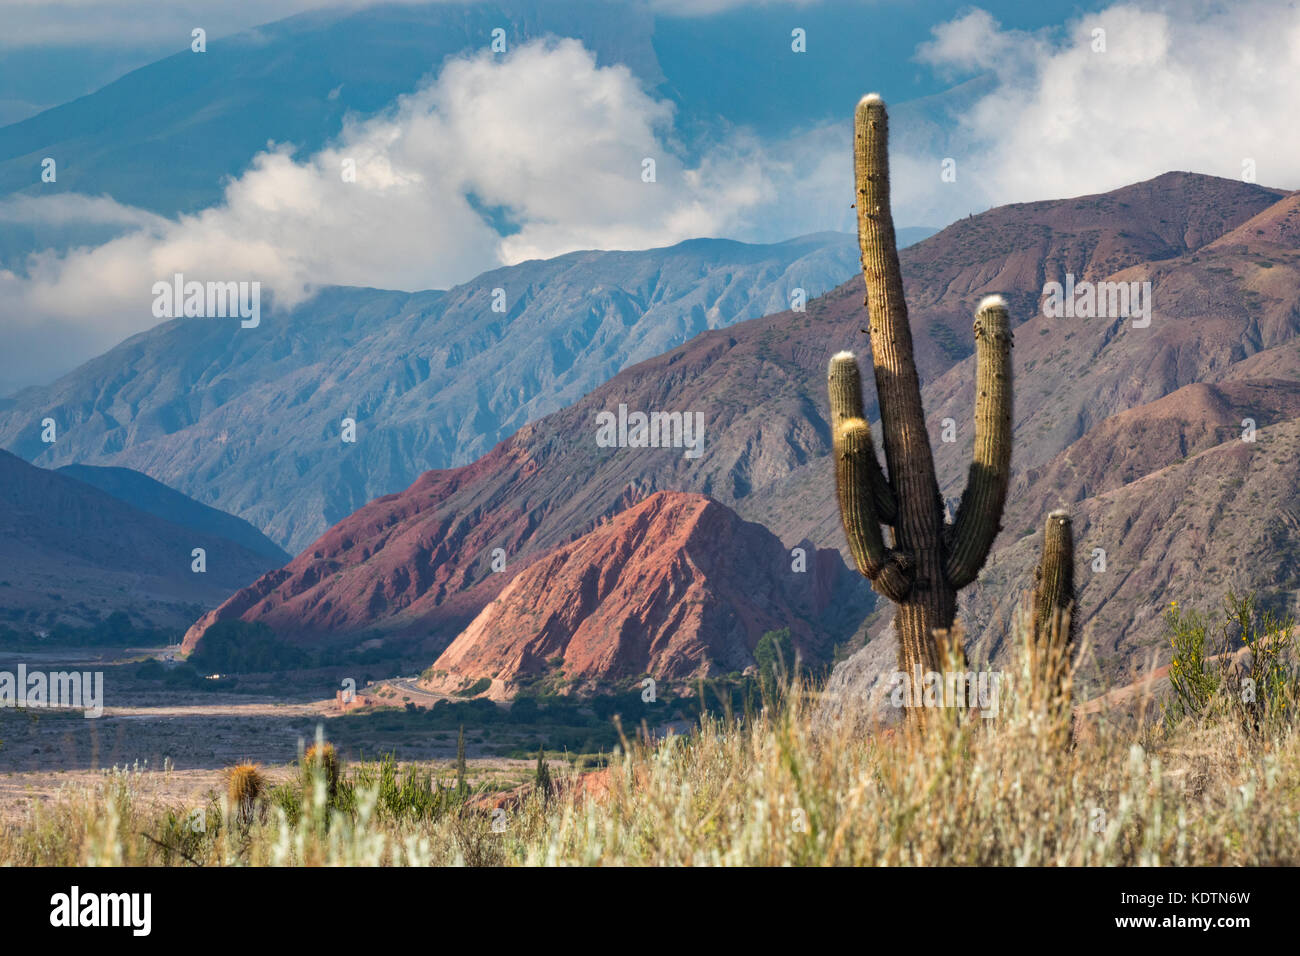 First light on the cactus and hills of  the Quebrada de Humahuacha nr Maimara, Jujuy Province, Argentina - Stock Image